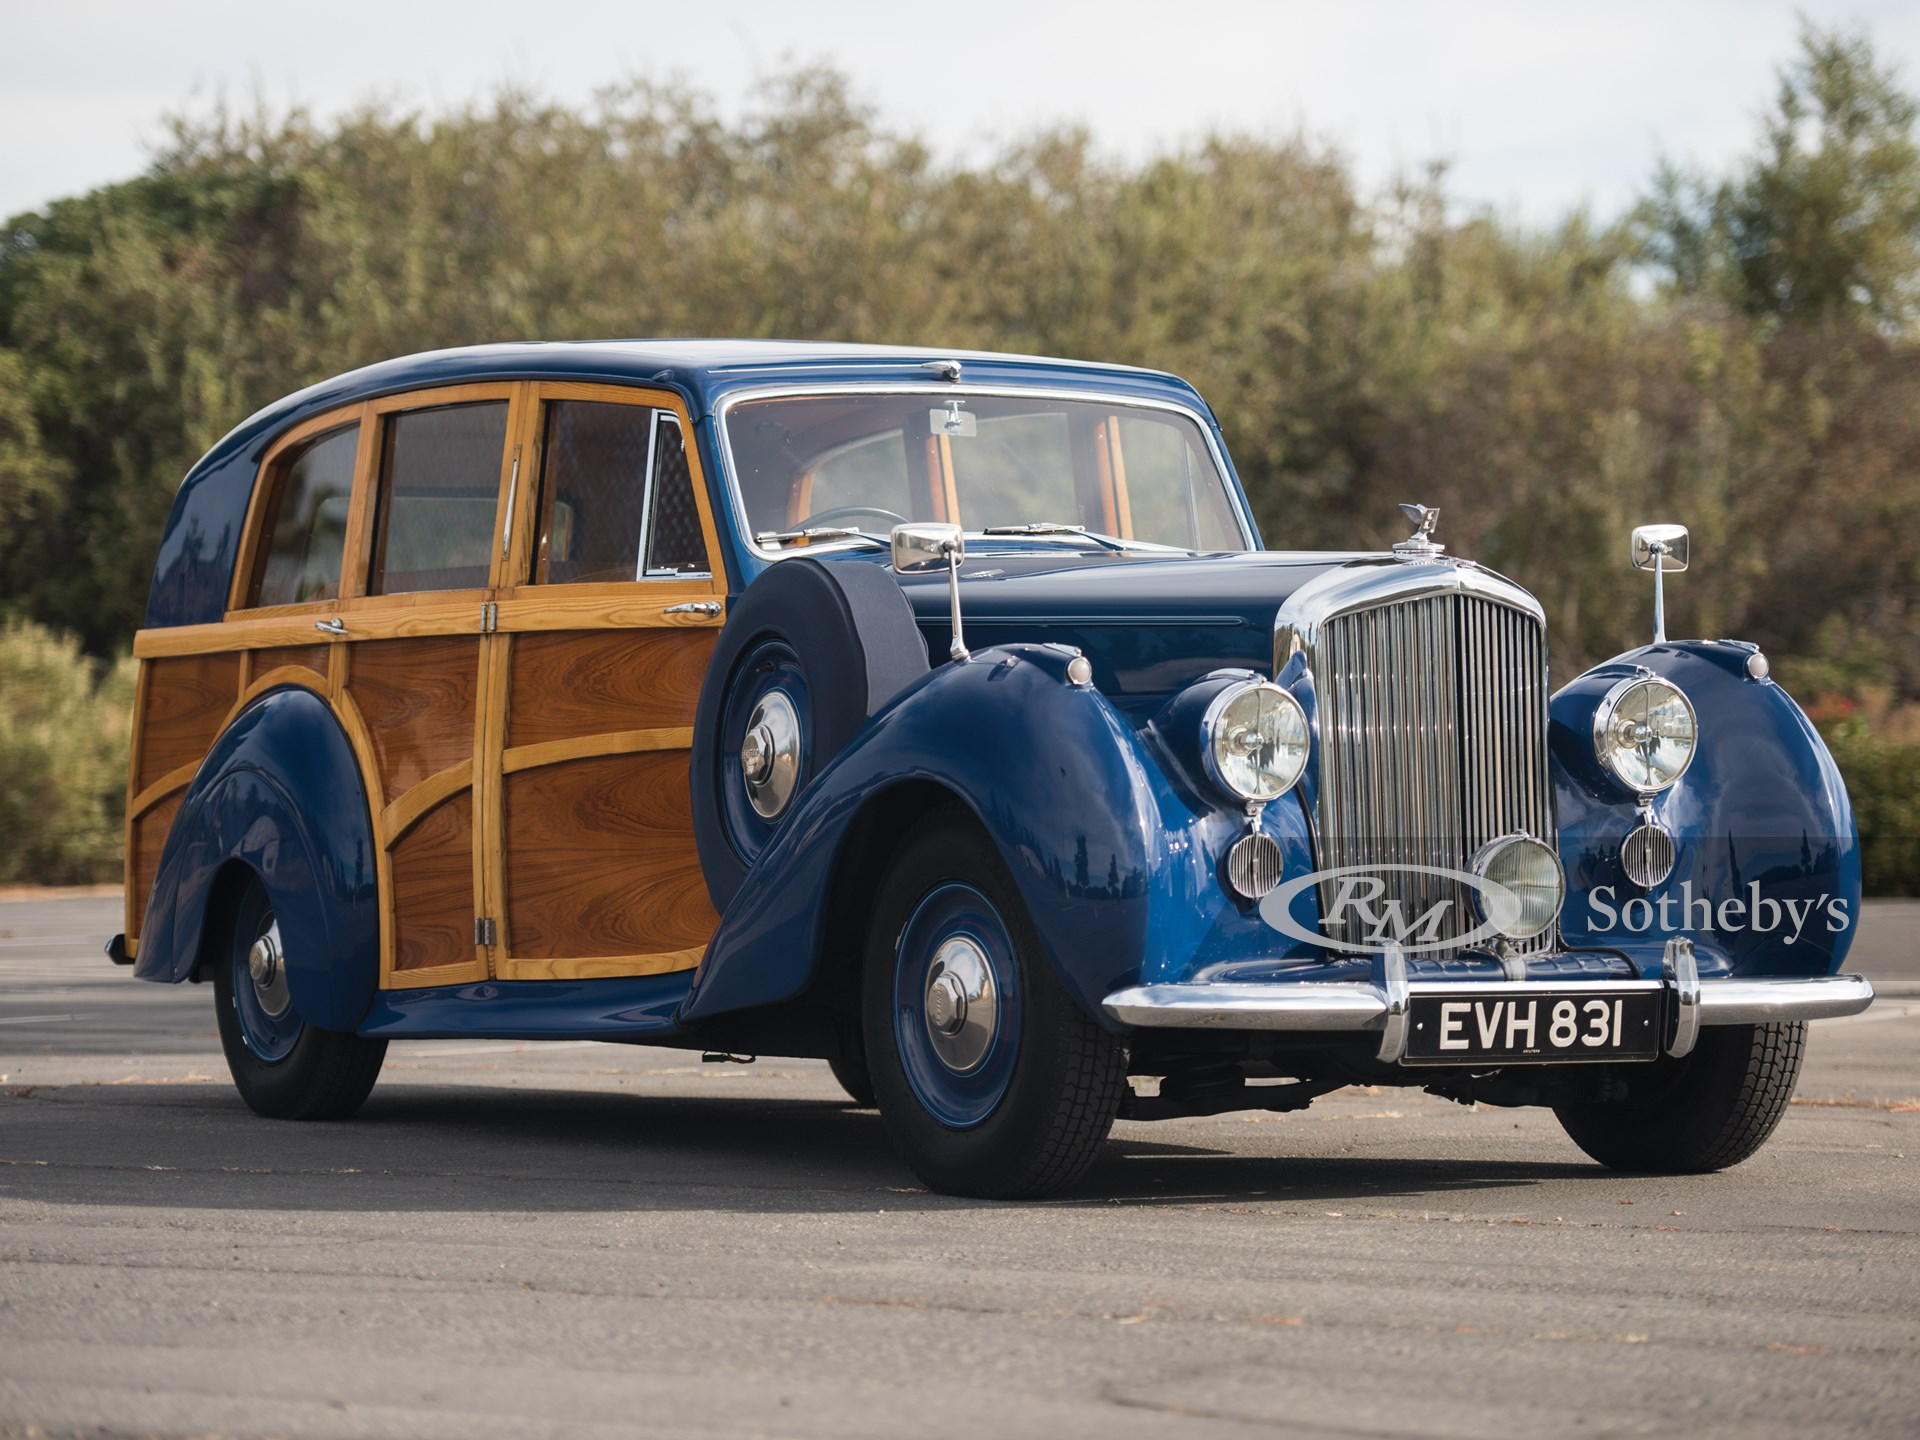 1949 Bentley Mark VI Estate Car by Rippon